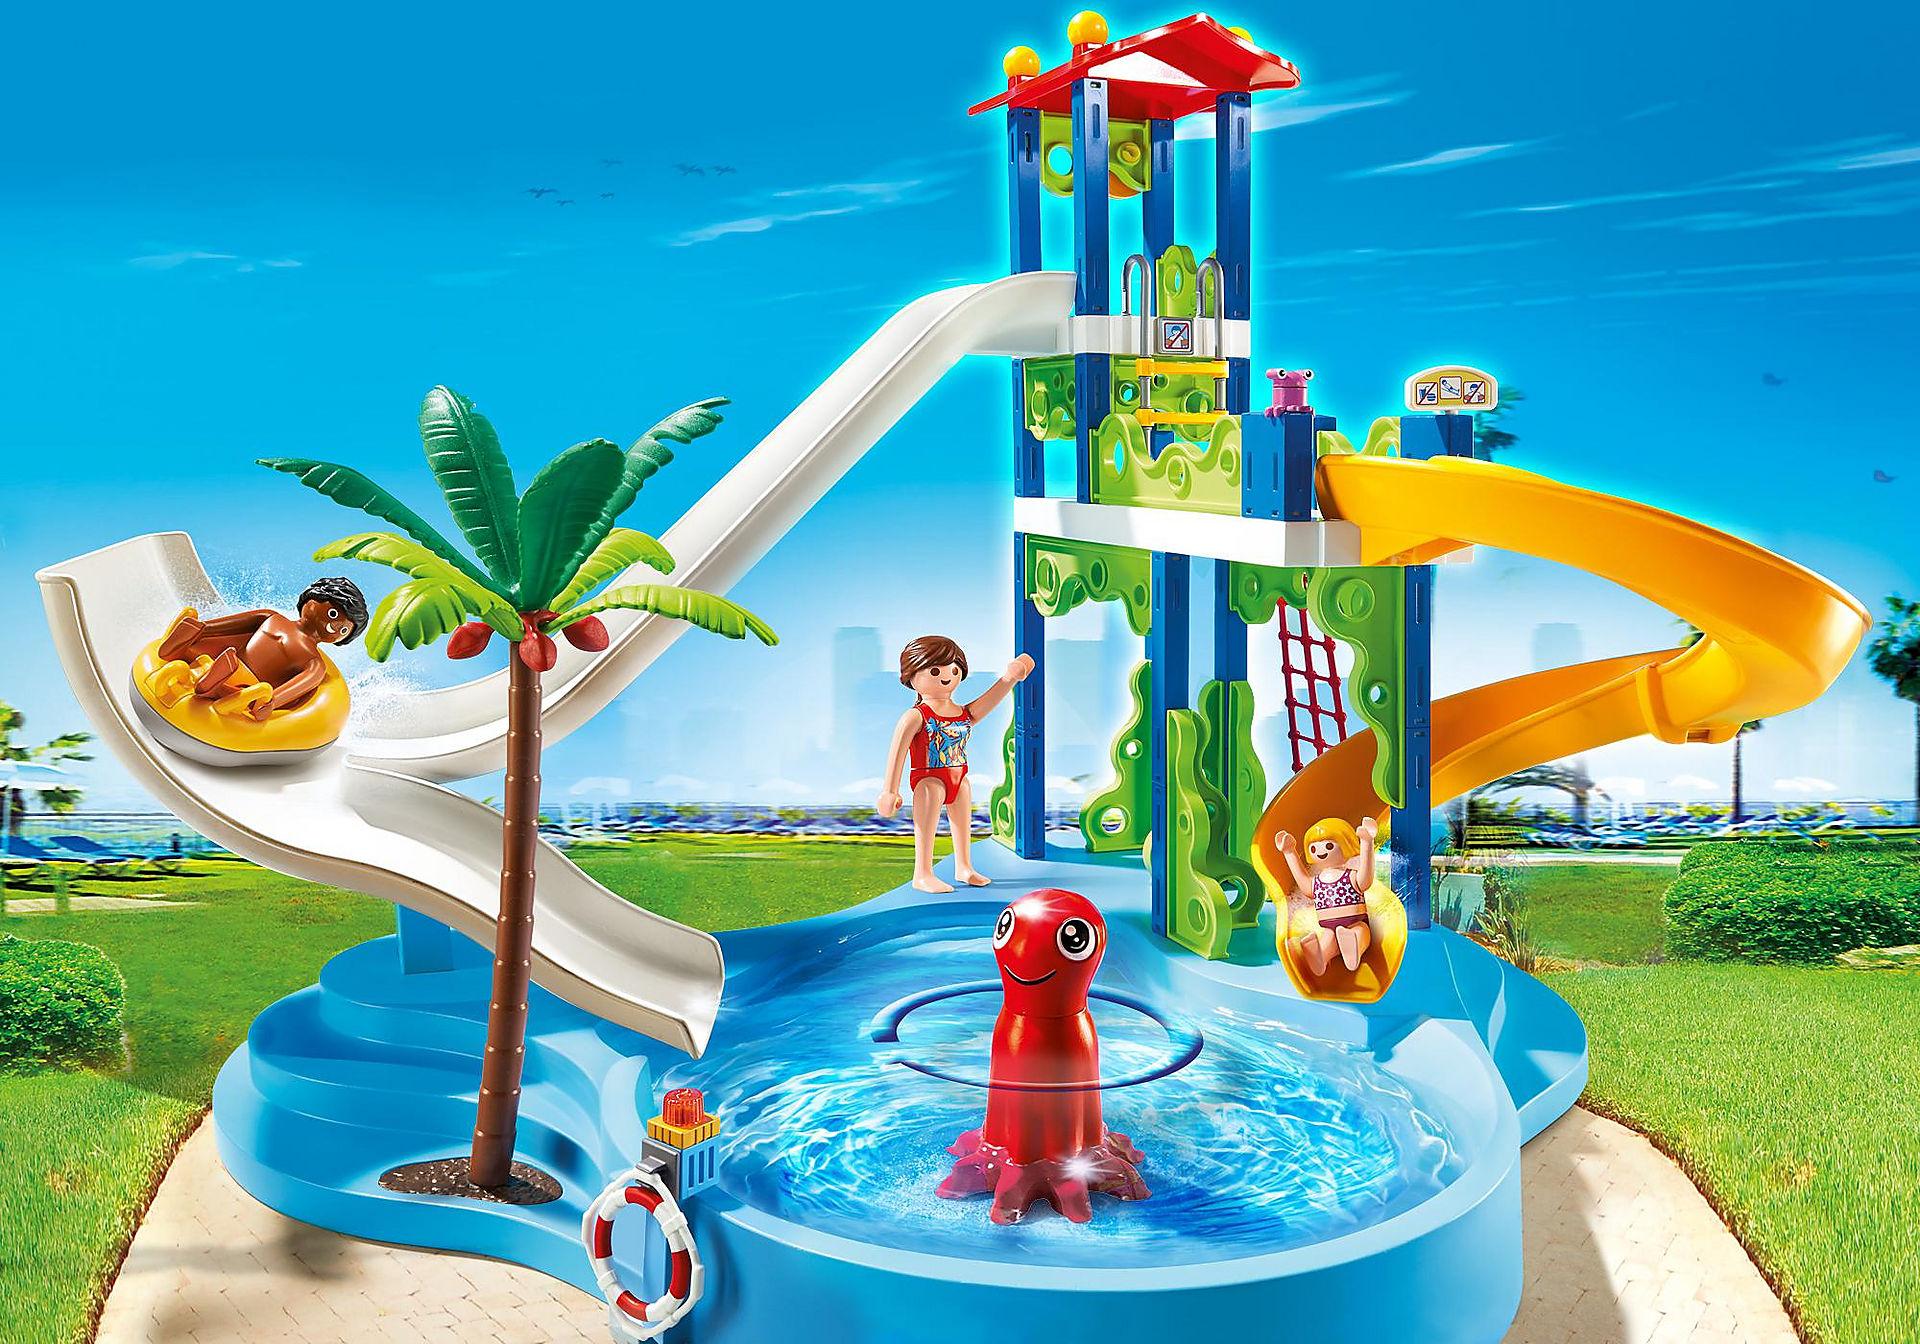 http://media.playmobil.com/i/playmobil/6669_product_detail/Torre degli scivoli con piscina